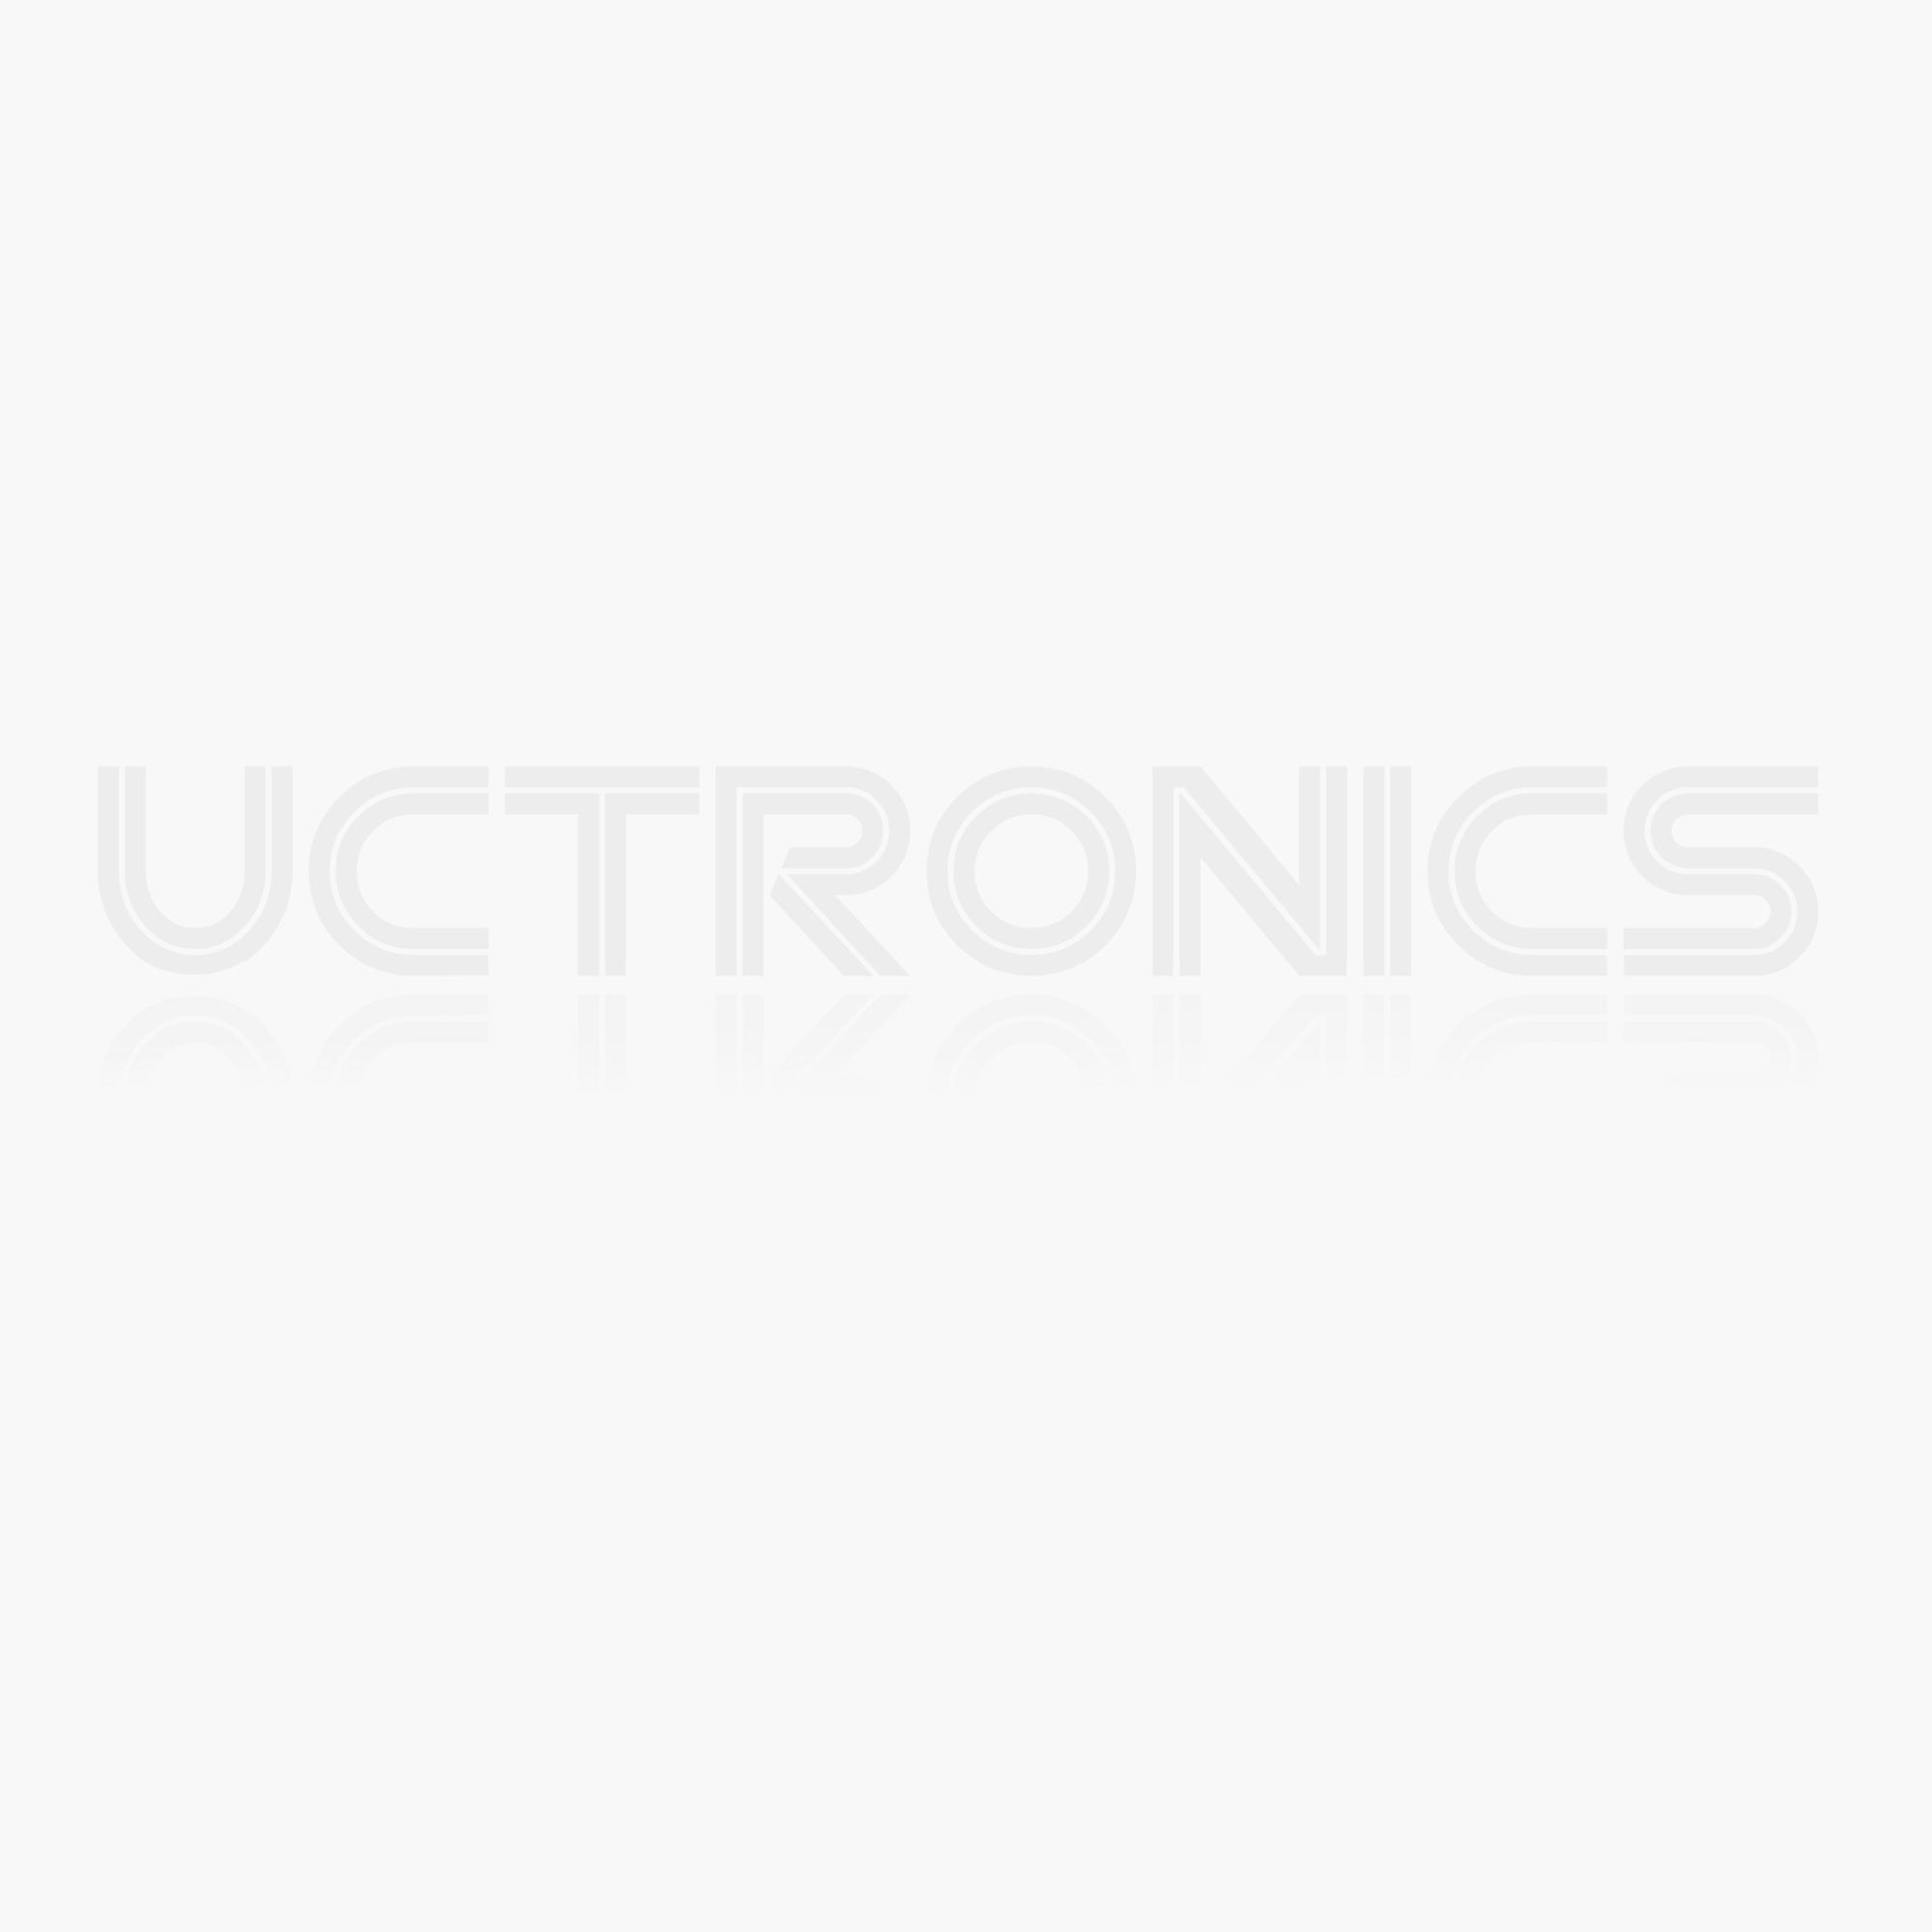 2Megapixel MT9D111 Auto Focus lens camera flex module with Adpater board